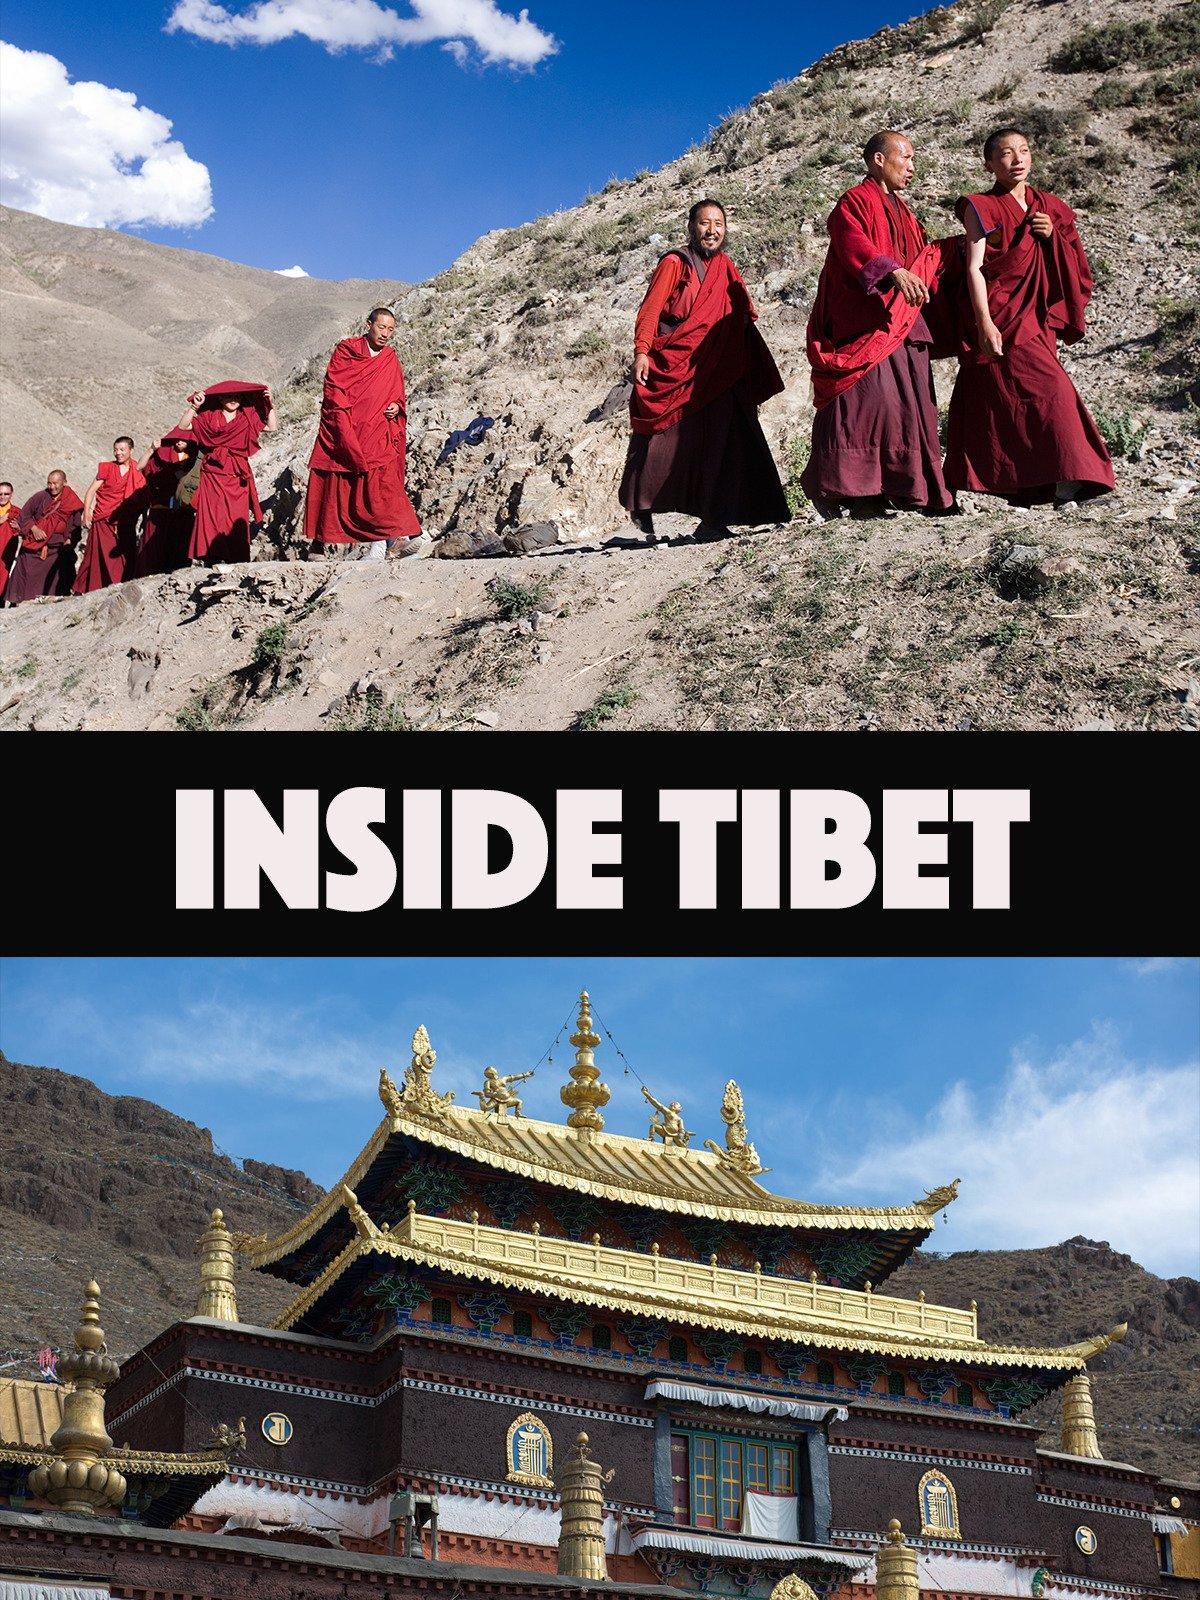 Inside Tibet